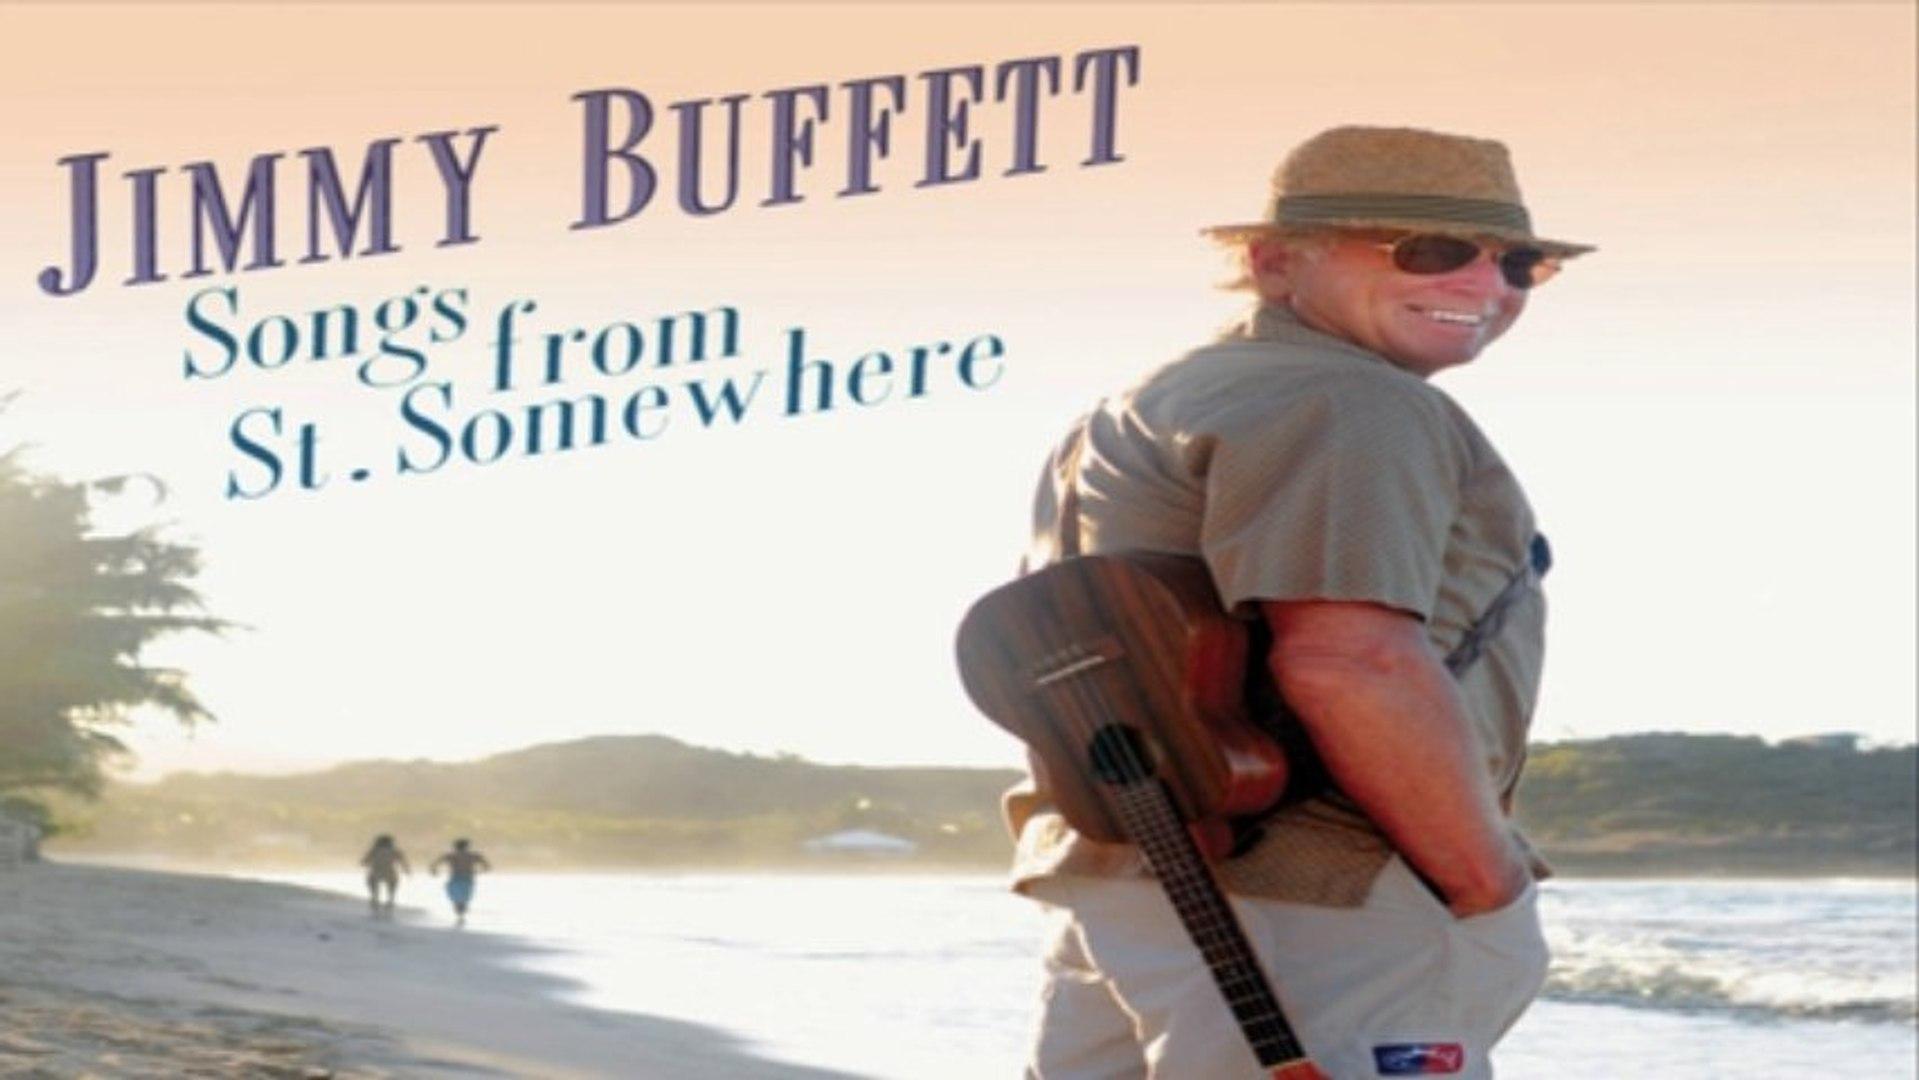 [ DOWNLOAD ALBUM ] Jimmy Buffett - Songs From St  Somewhere [ iTunesRip ]